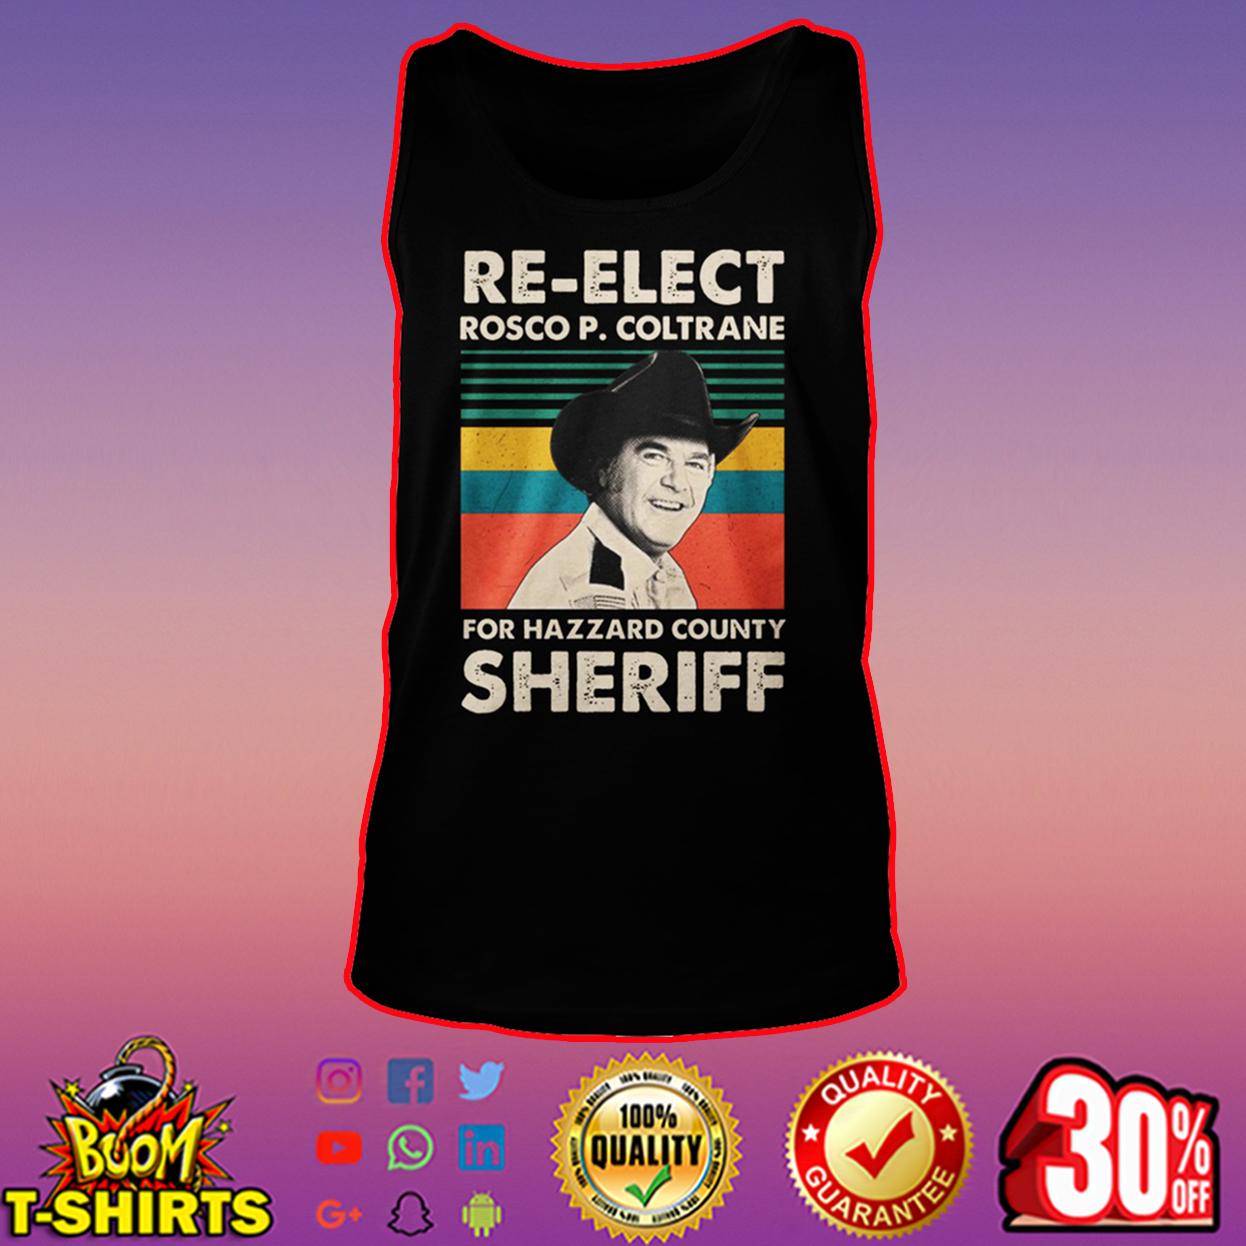 Re-Elect Rosco P Coltrane for Hazzard County Sheriff Shirt